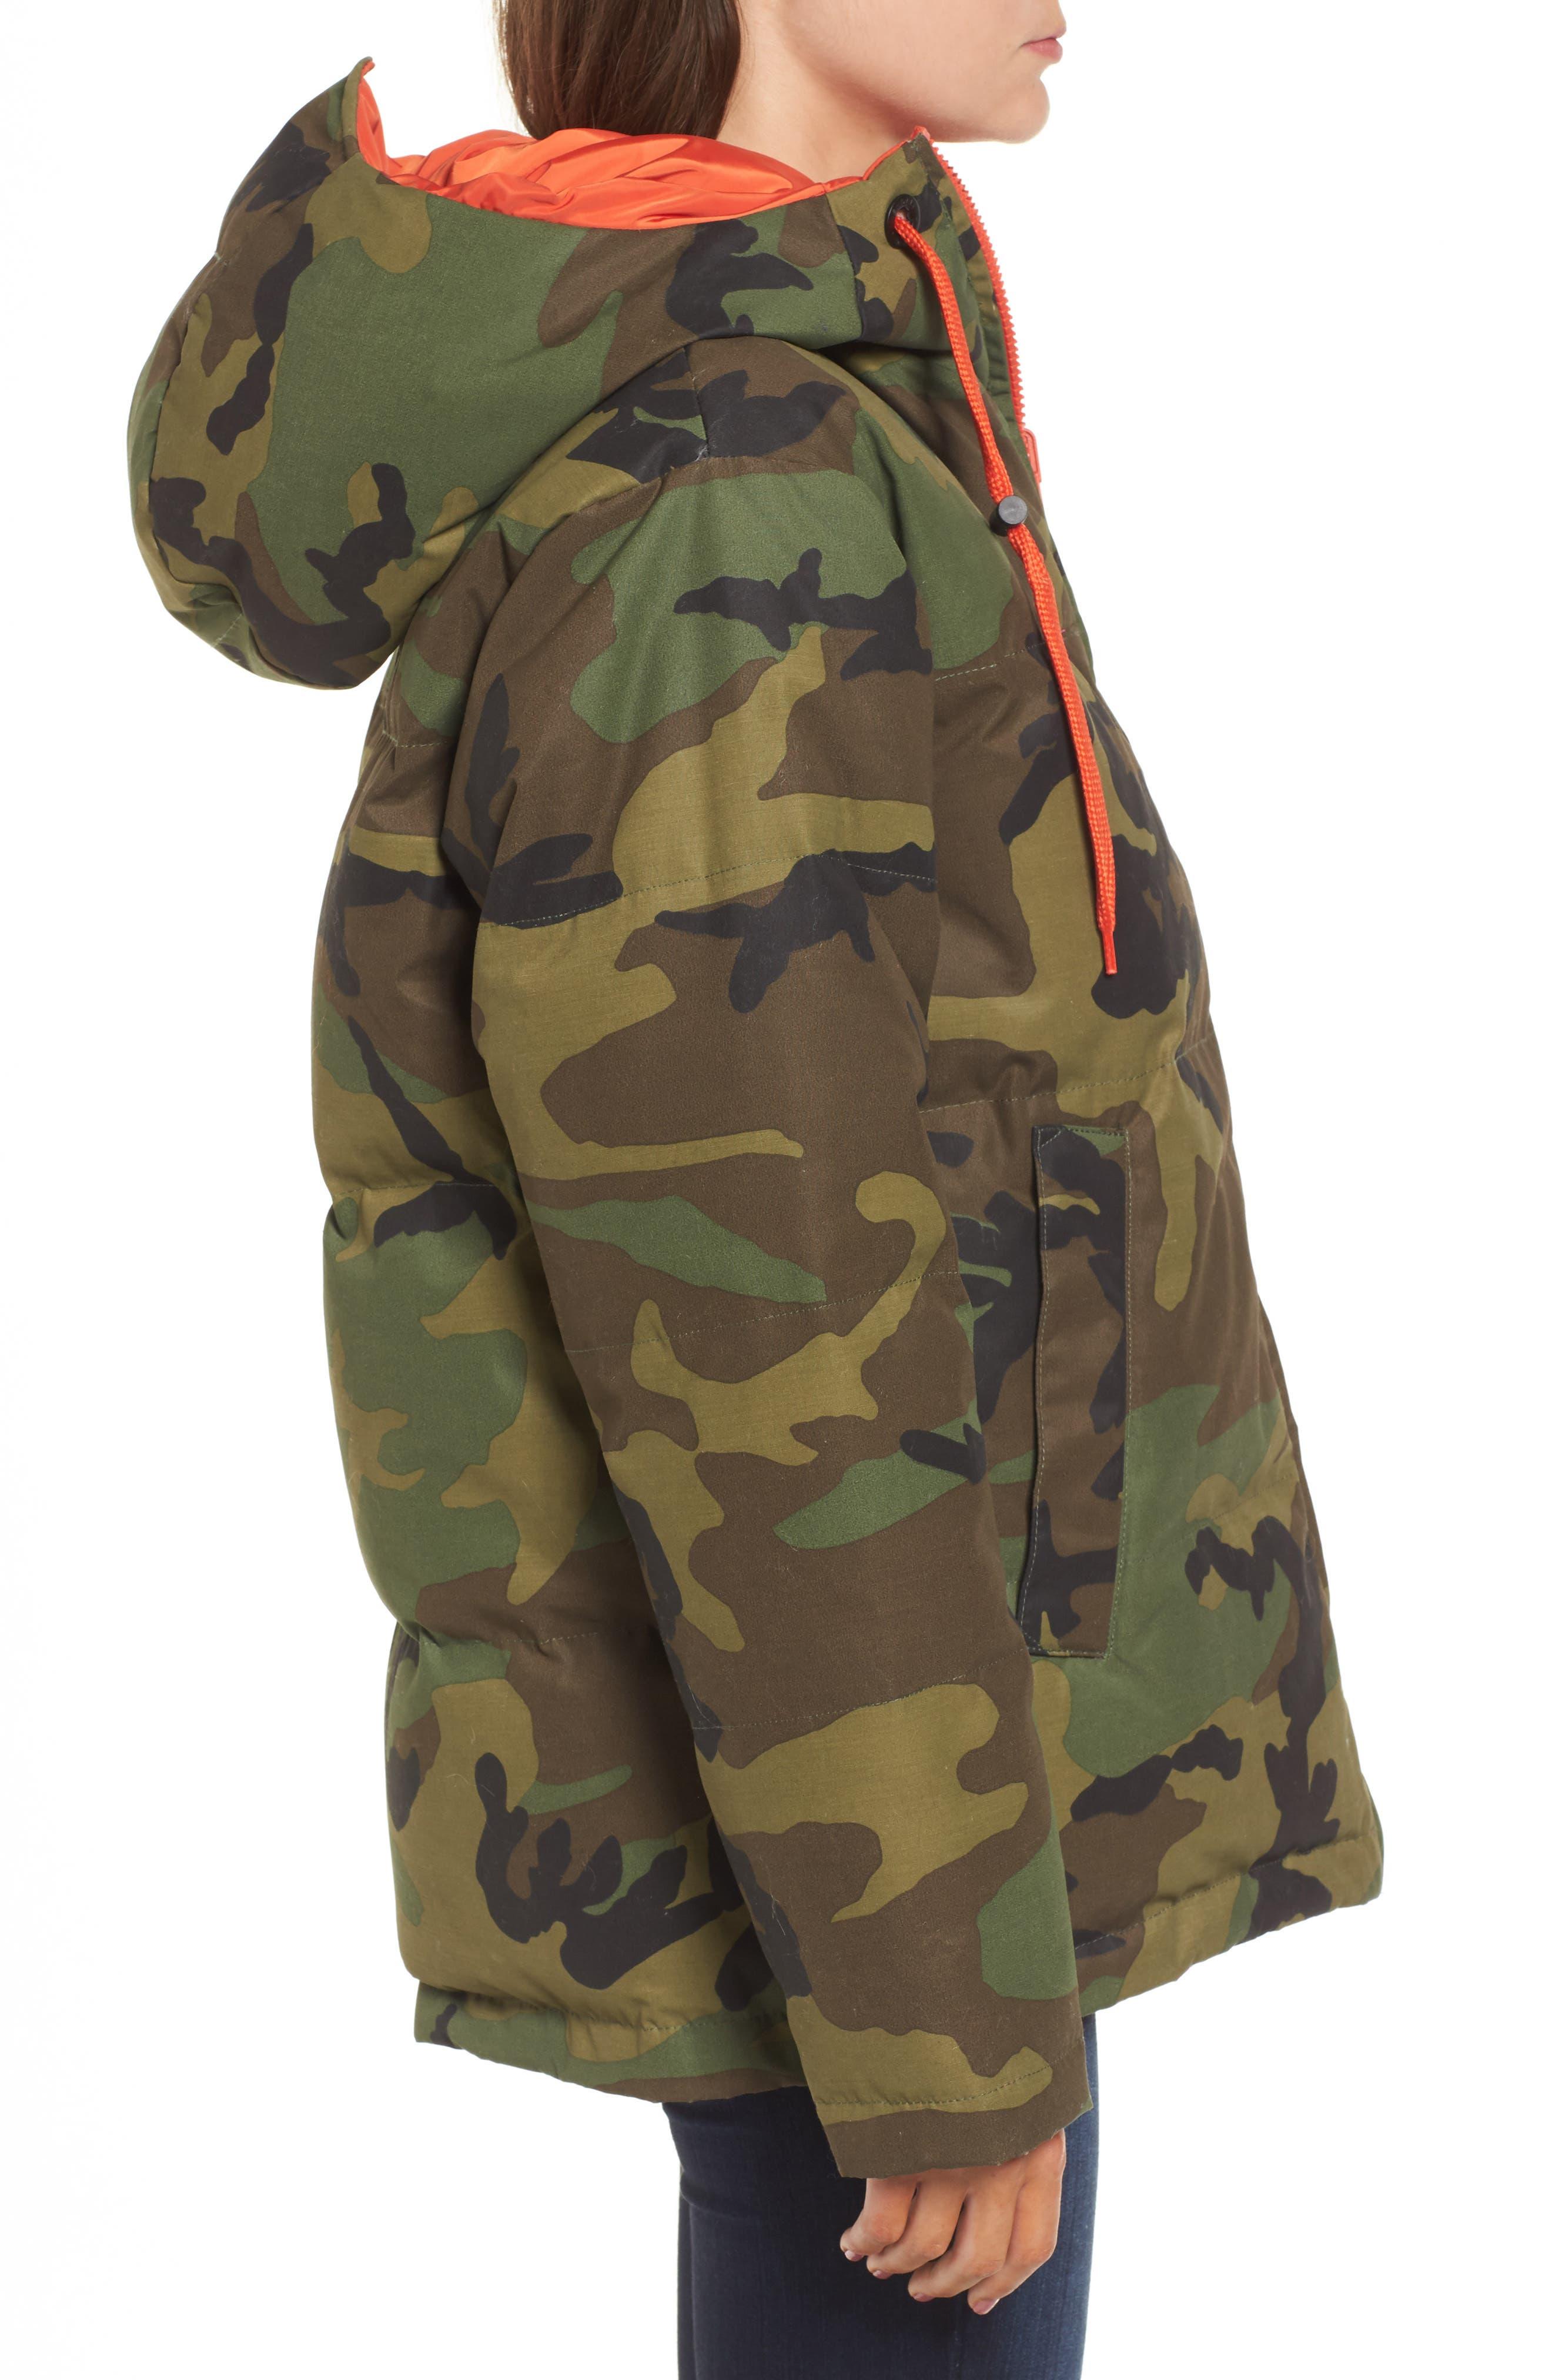 Reversible Puffer Jacket,                             Alternate thumbnail 5, color,                             Camo/ Orange